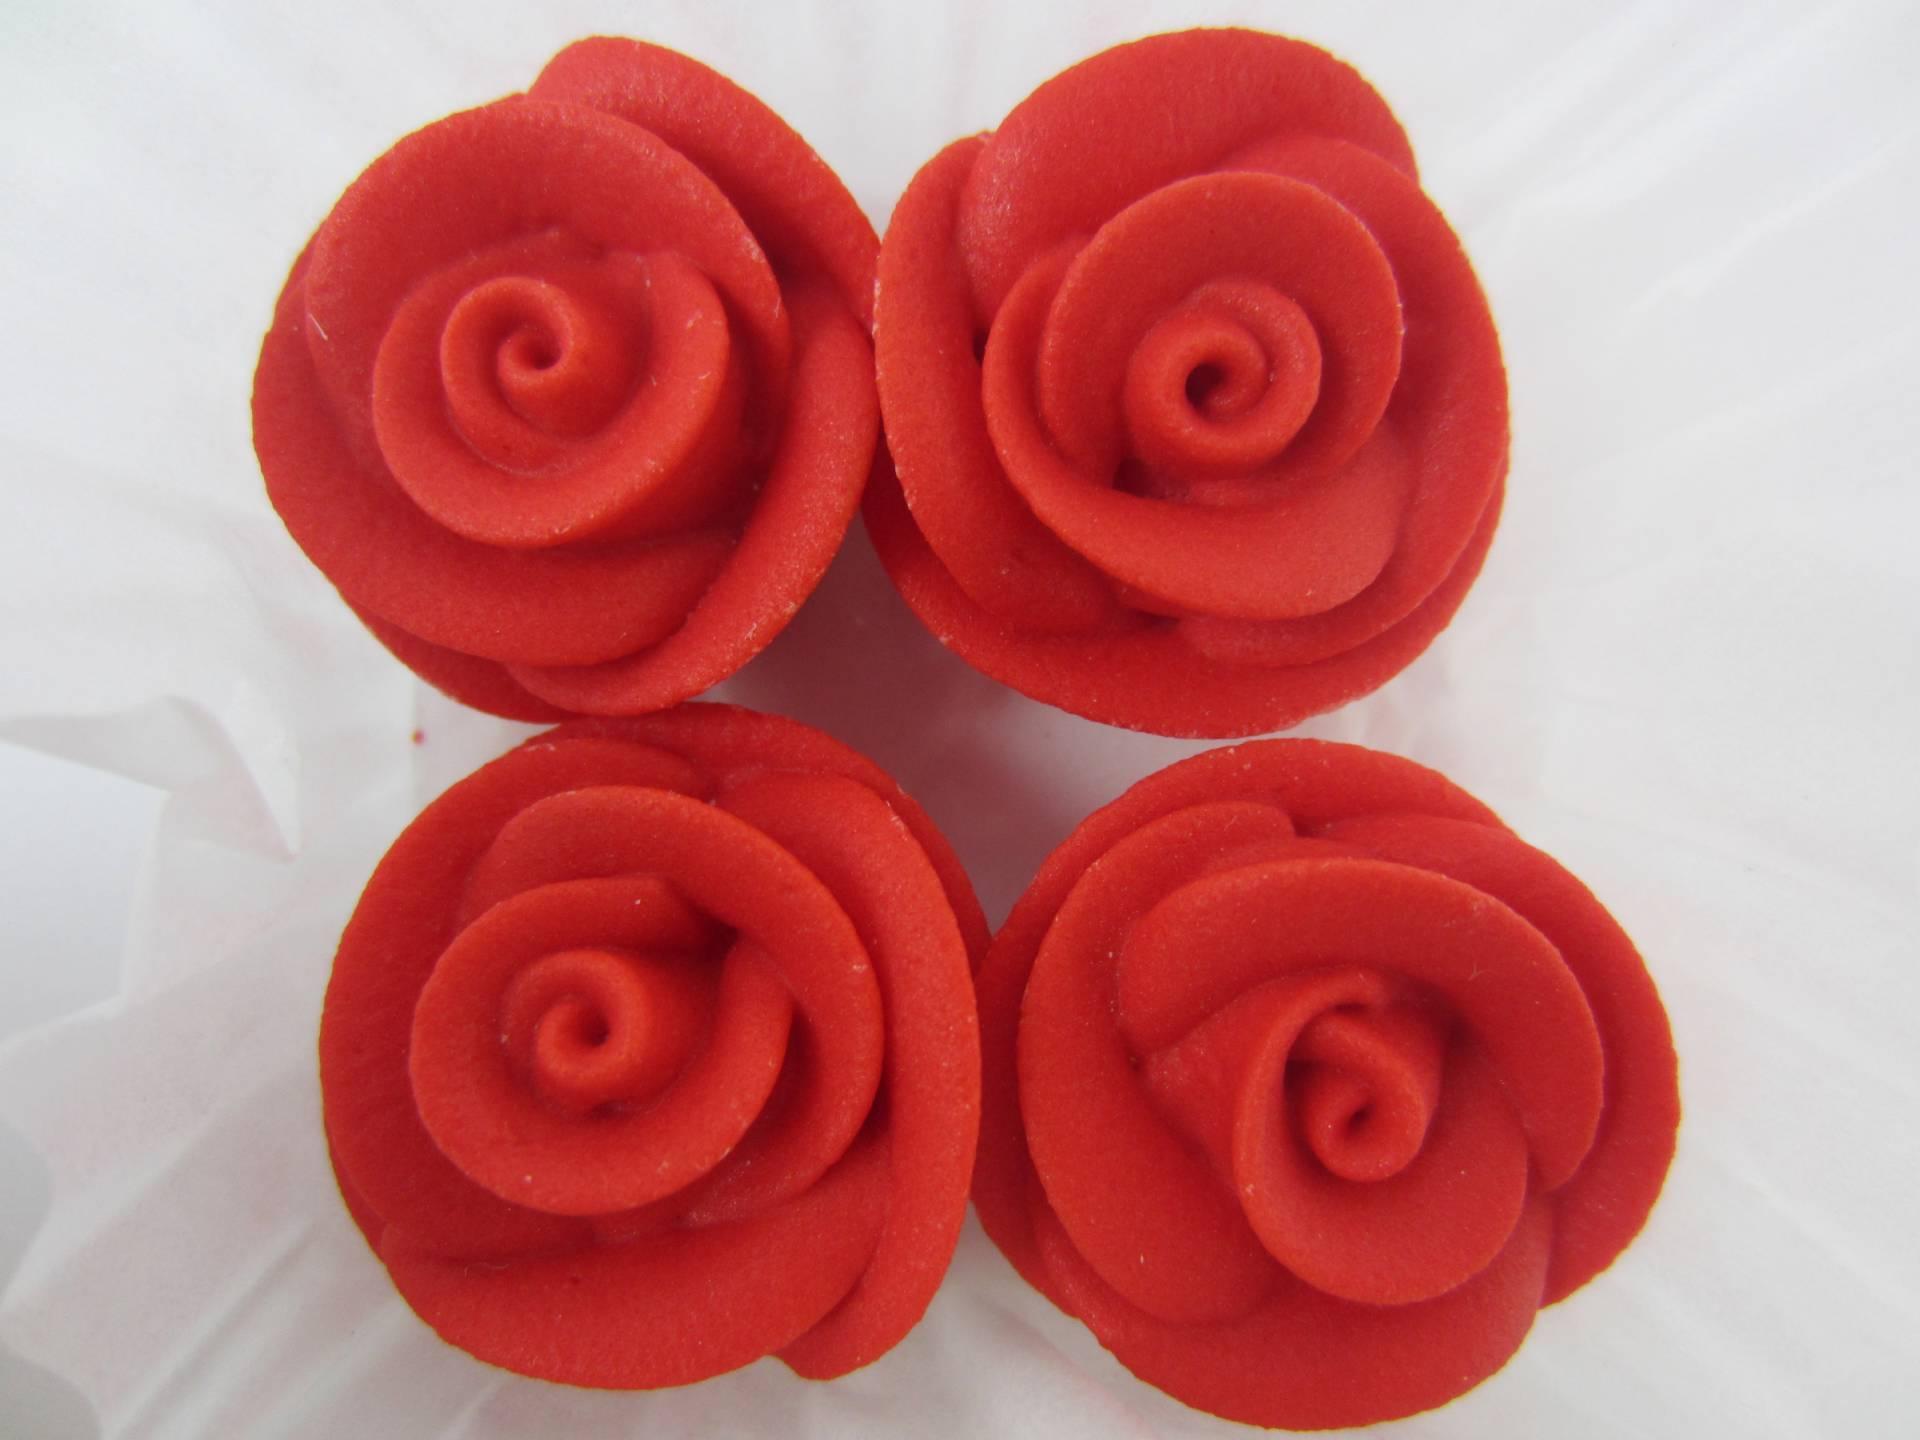 Edible Rose Cake Decoration : 24xEdible RED Roses Cupcake Cake Toppers Sugar ...